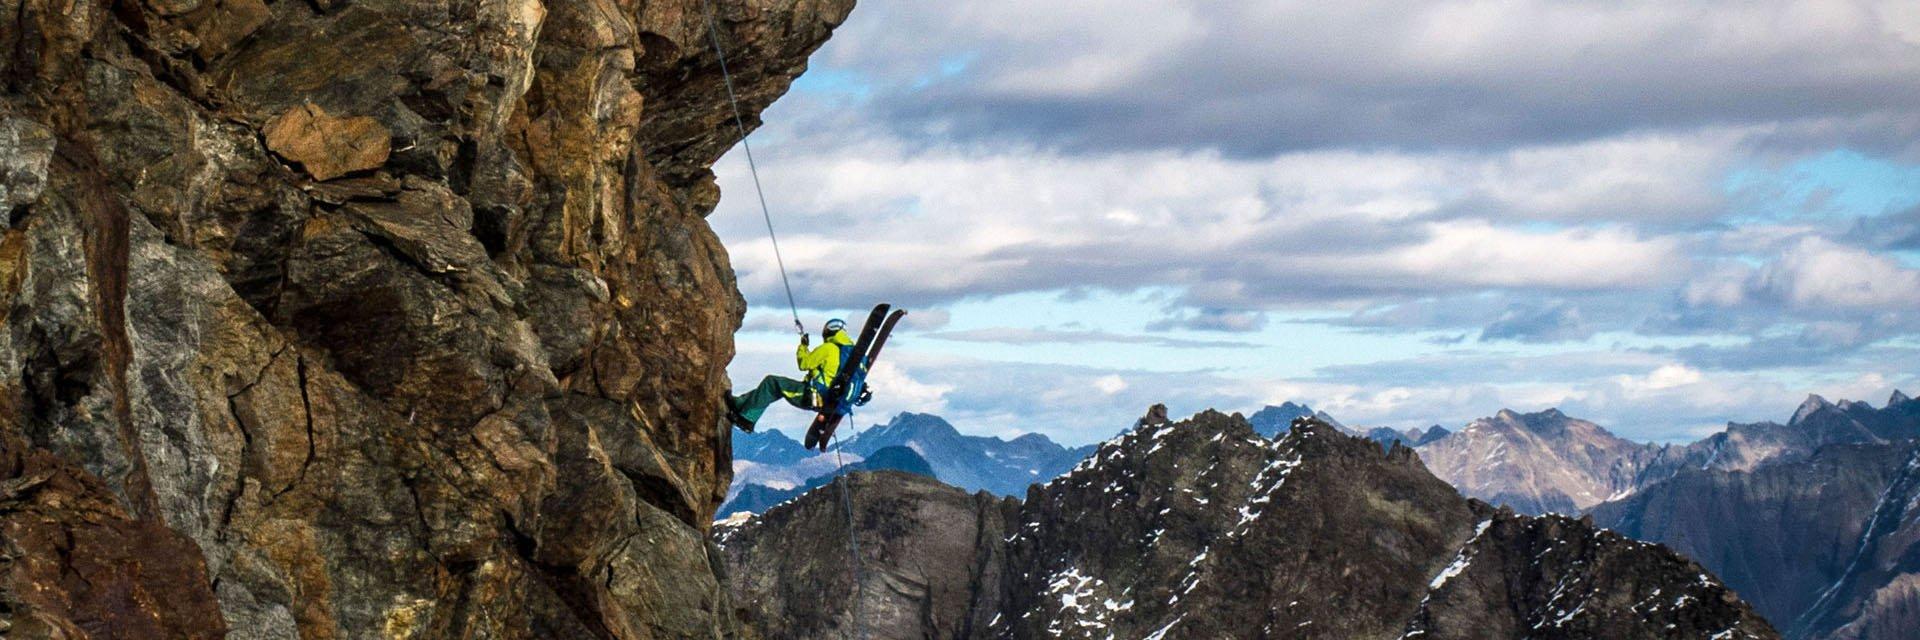 Stephan Verheij snowboard  Mountaineering Sölden